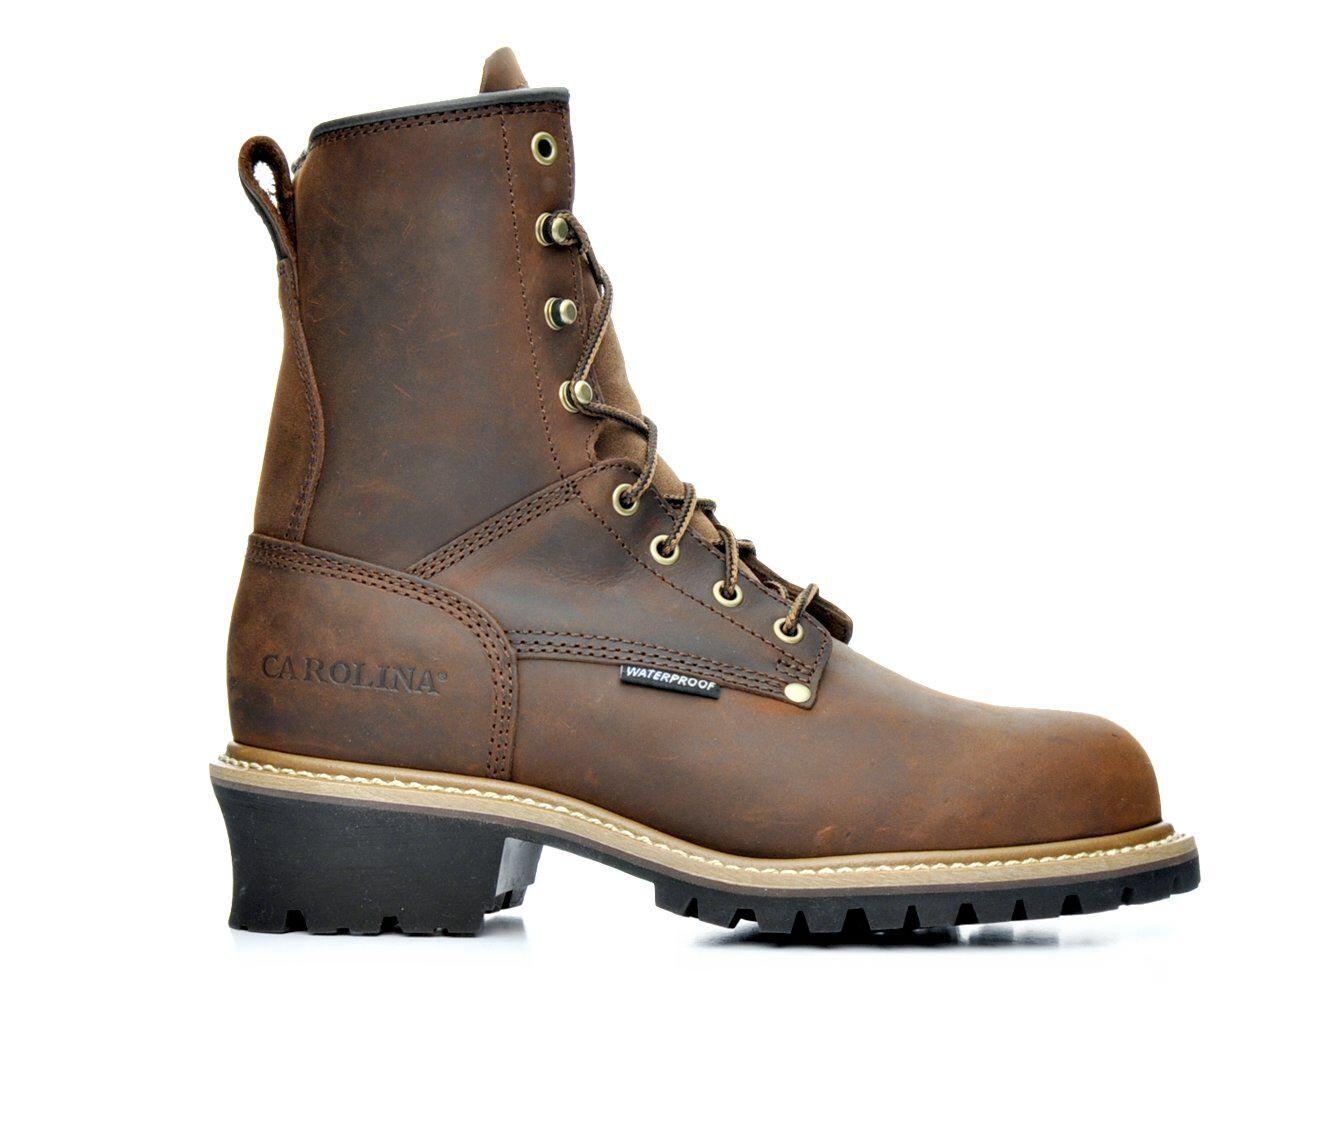 Men's Carolina Boots CA9821 8 In Steel